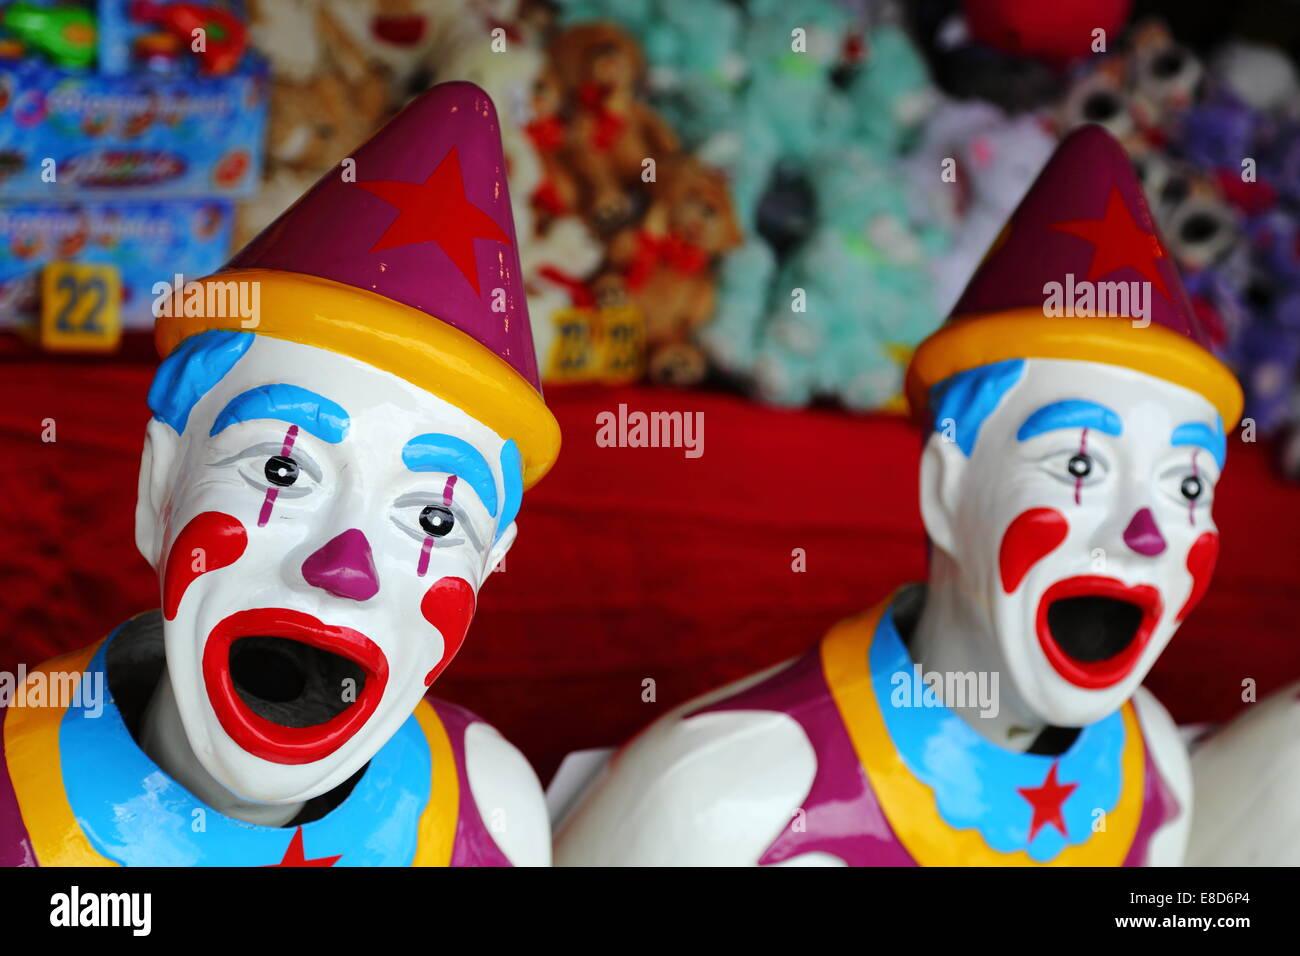 sideshow clown game stock photo royalty free image 48195196 alamy